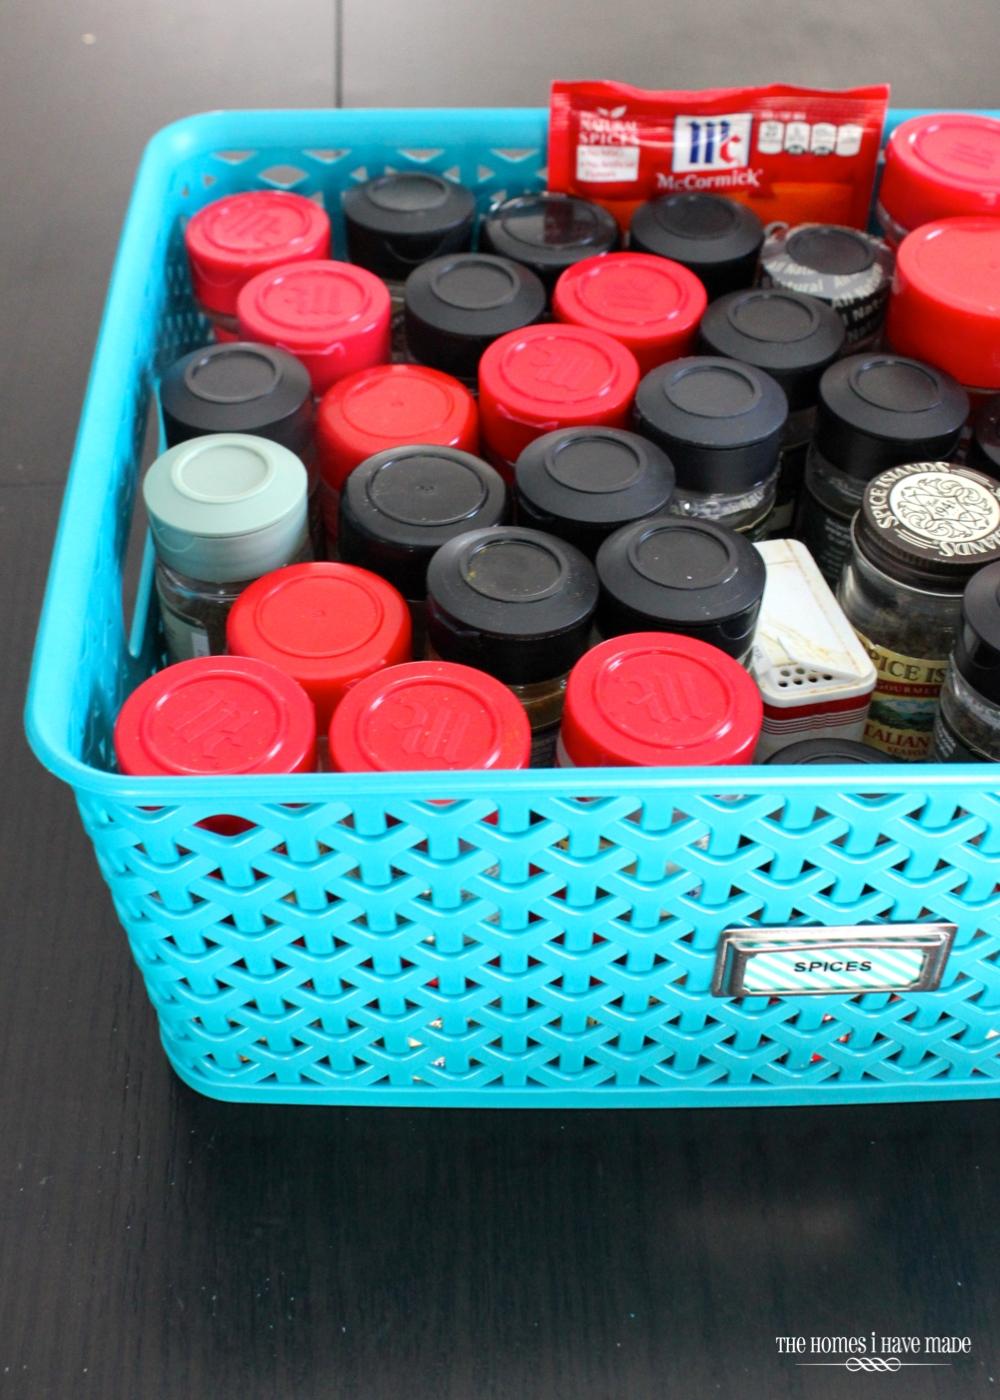 blue basket containing spice jars